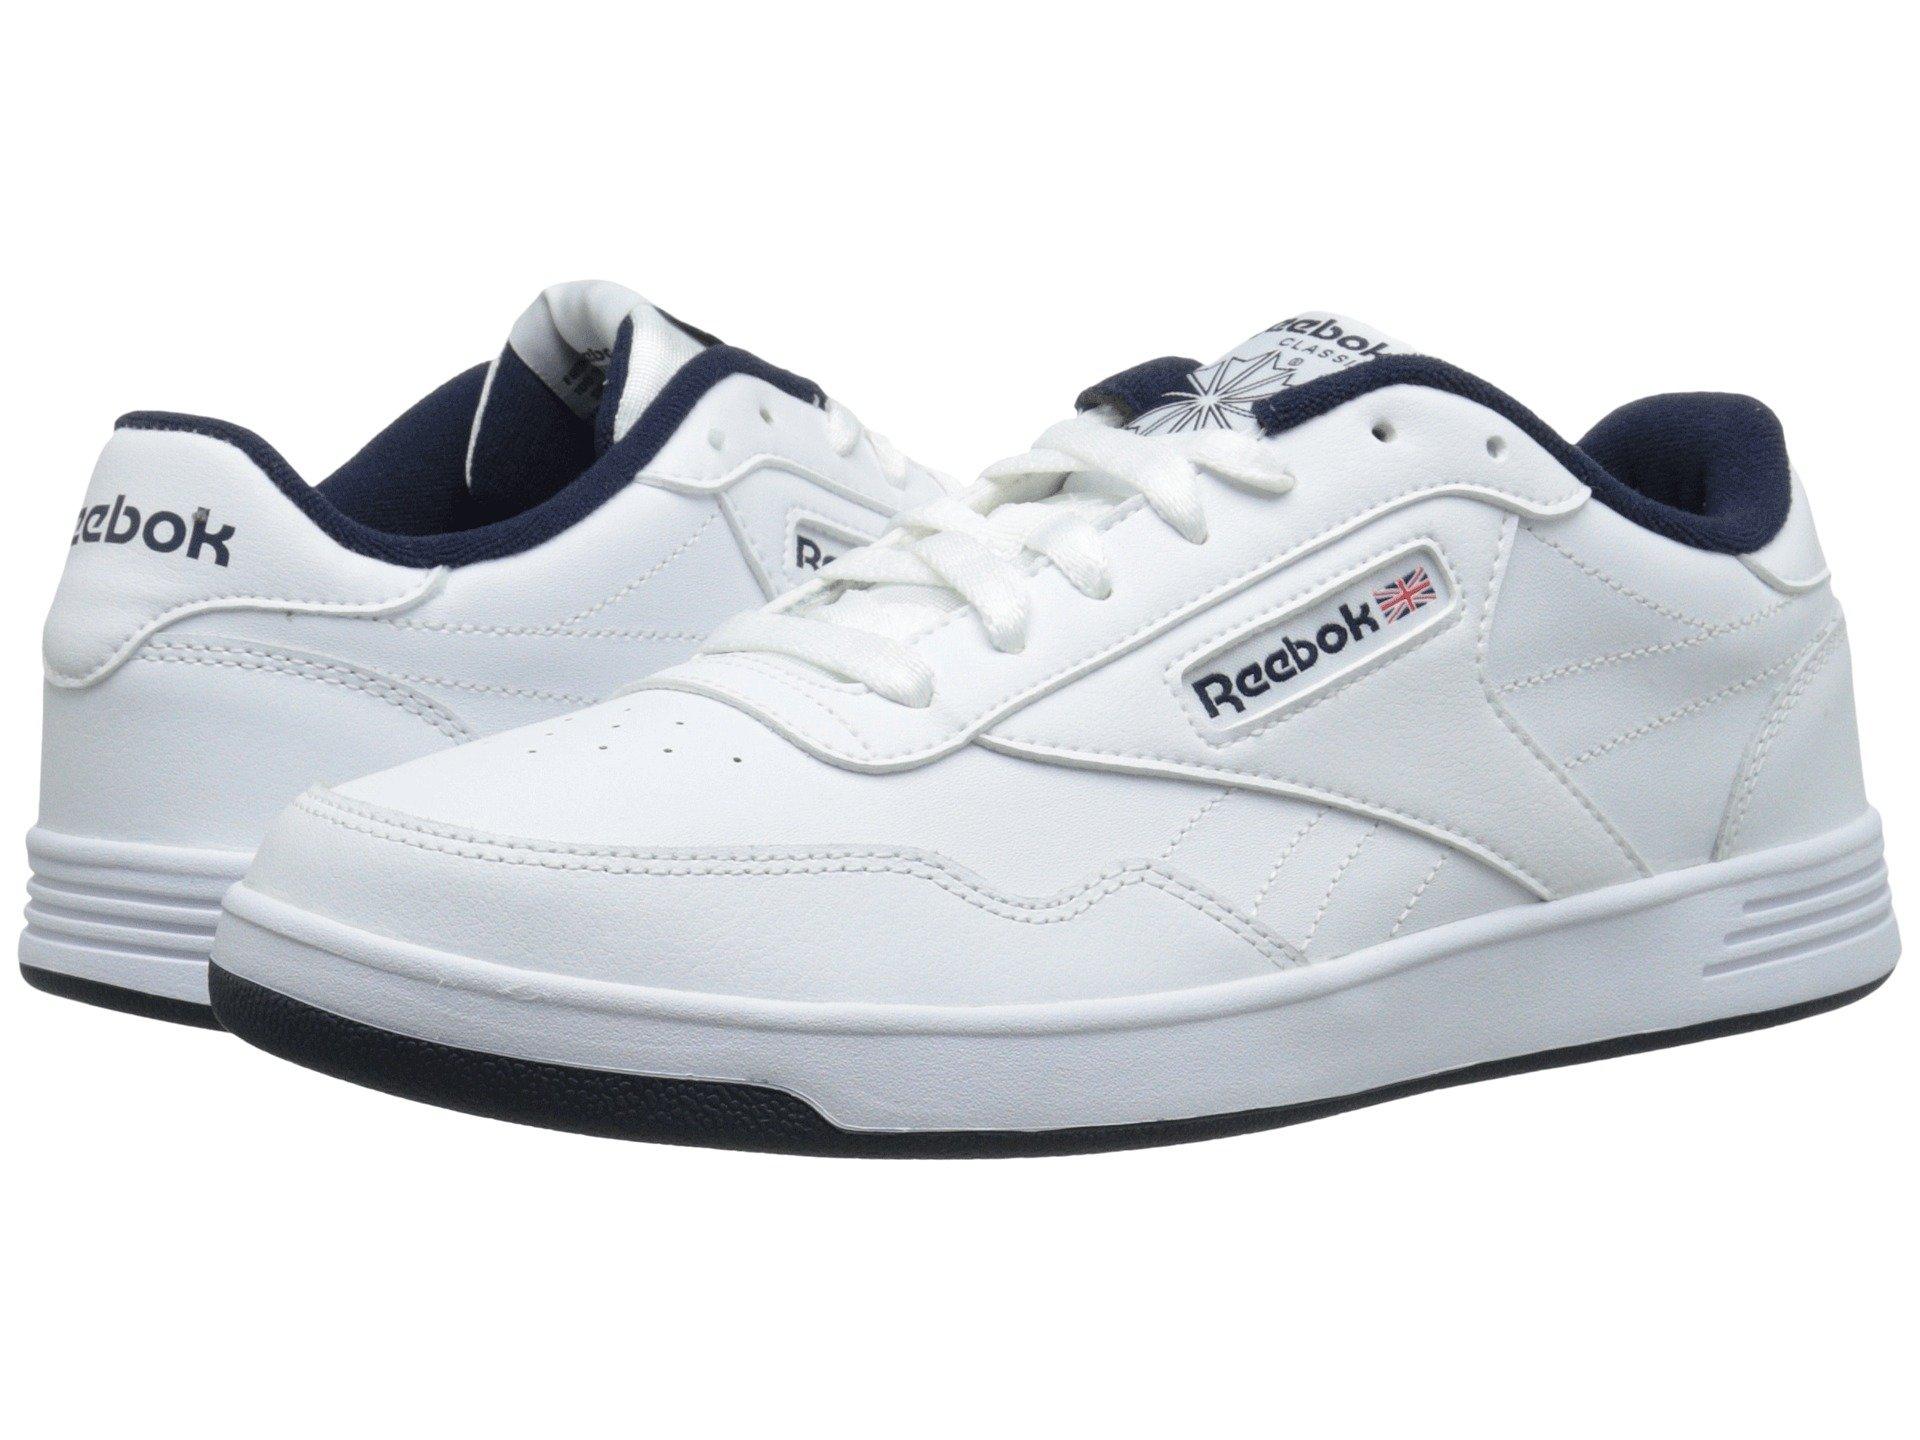 dc0649680056 Buy reebok men s club memt classic sneaker Sport Online - 41% OFF!